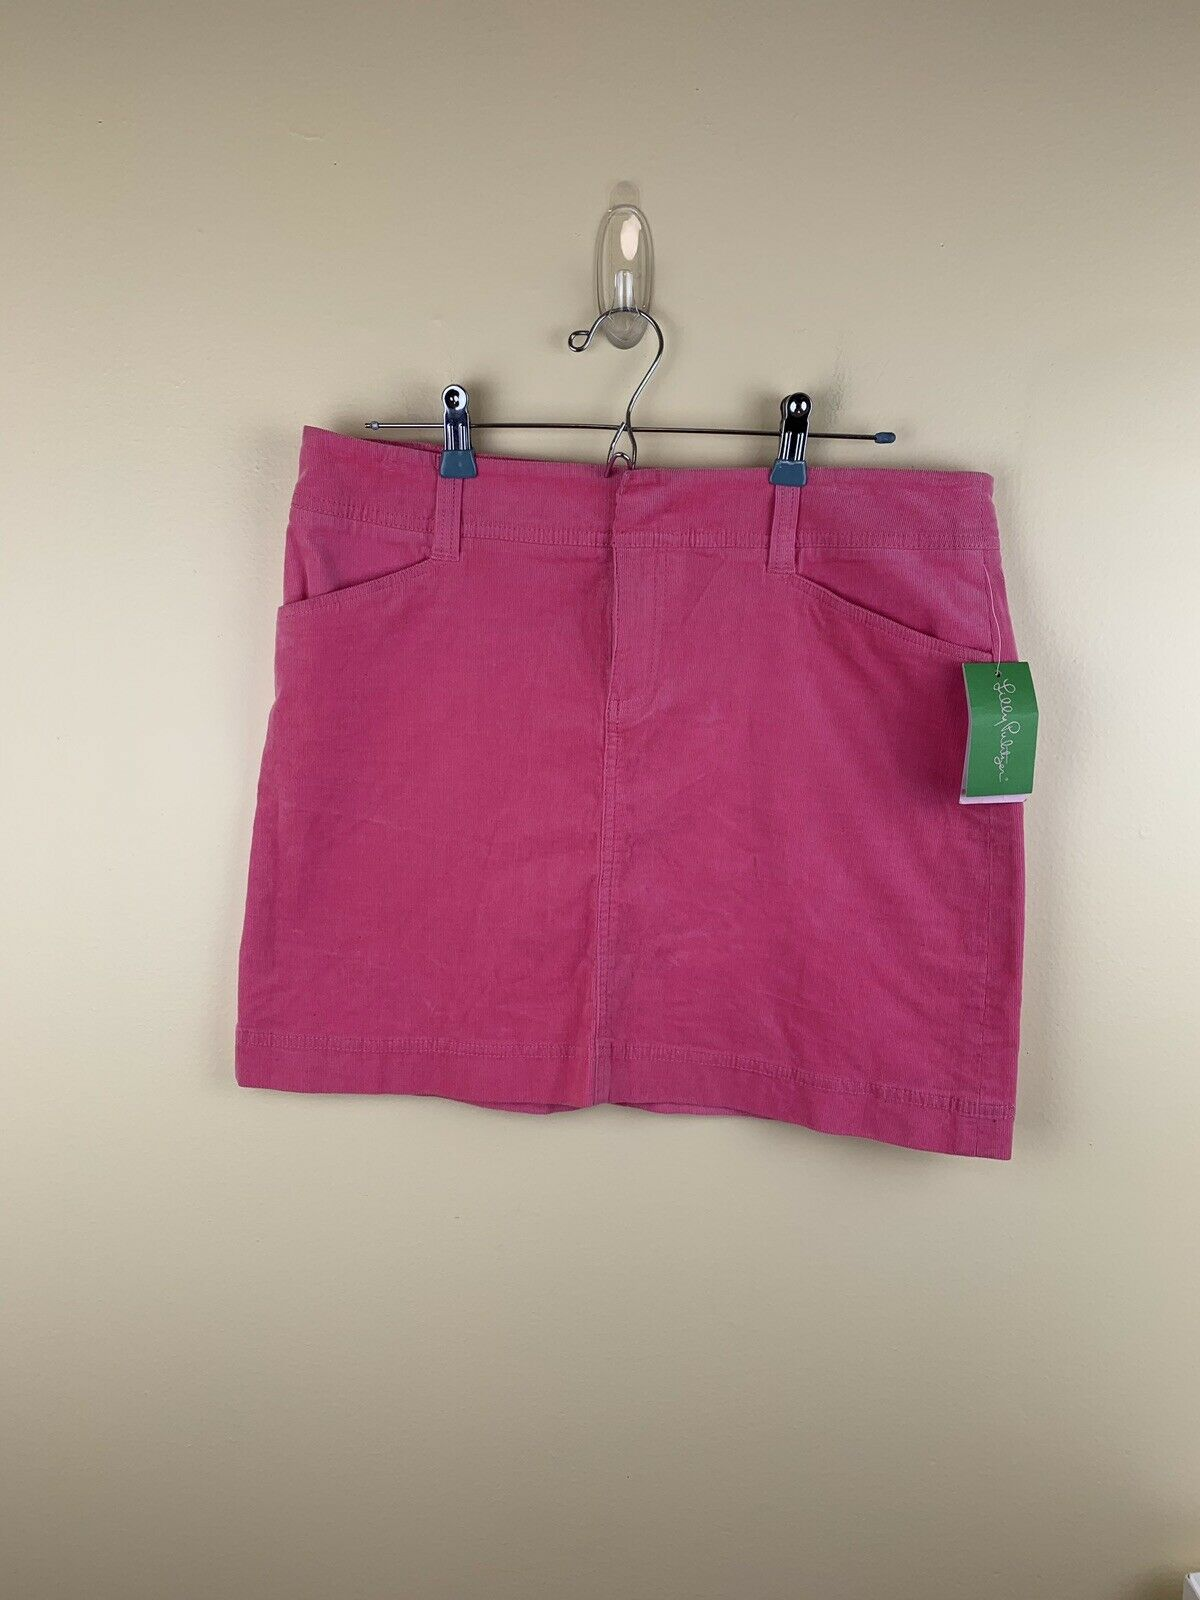 Lilly Pulitzer Women Sz 10 Pink Corduroy Mini Skirt B10